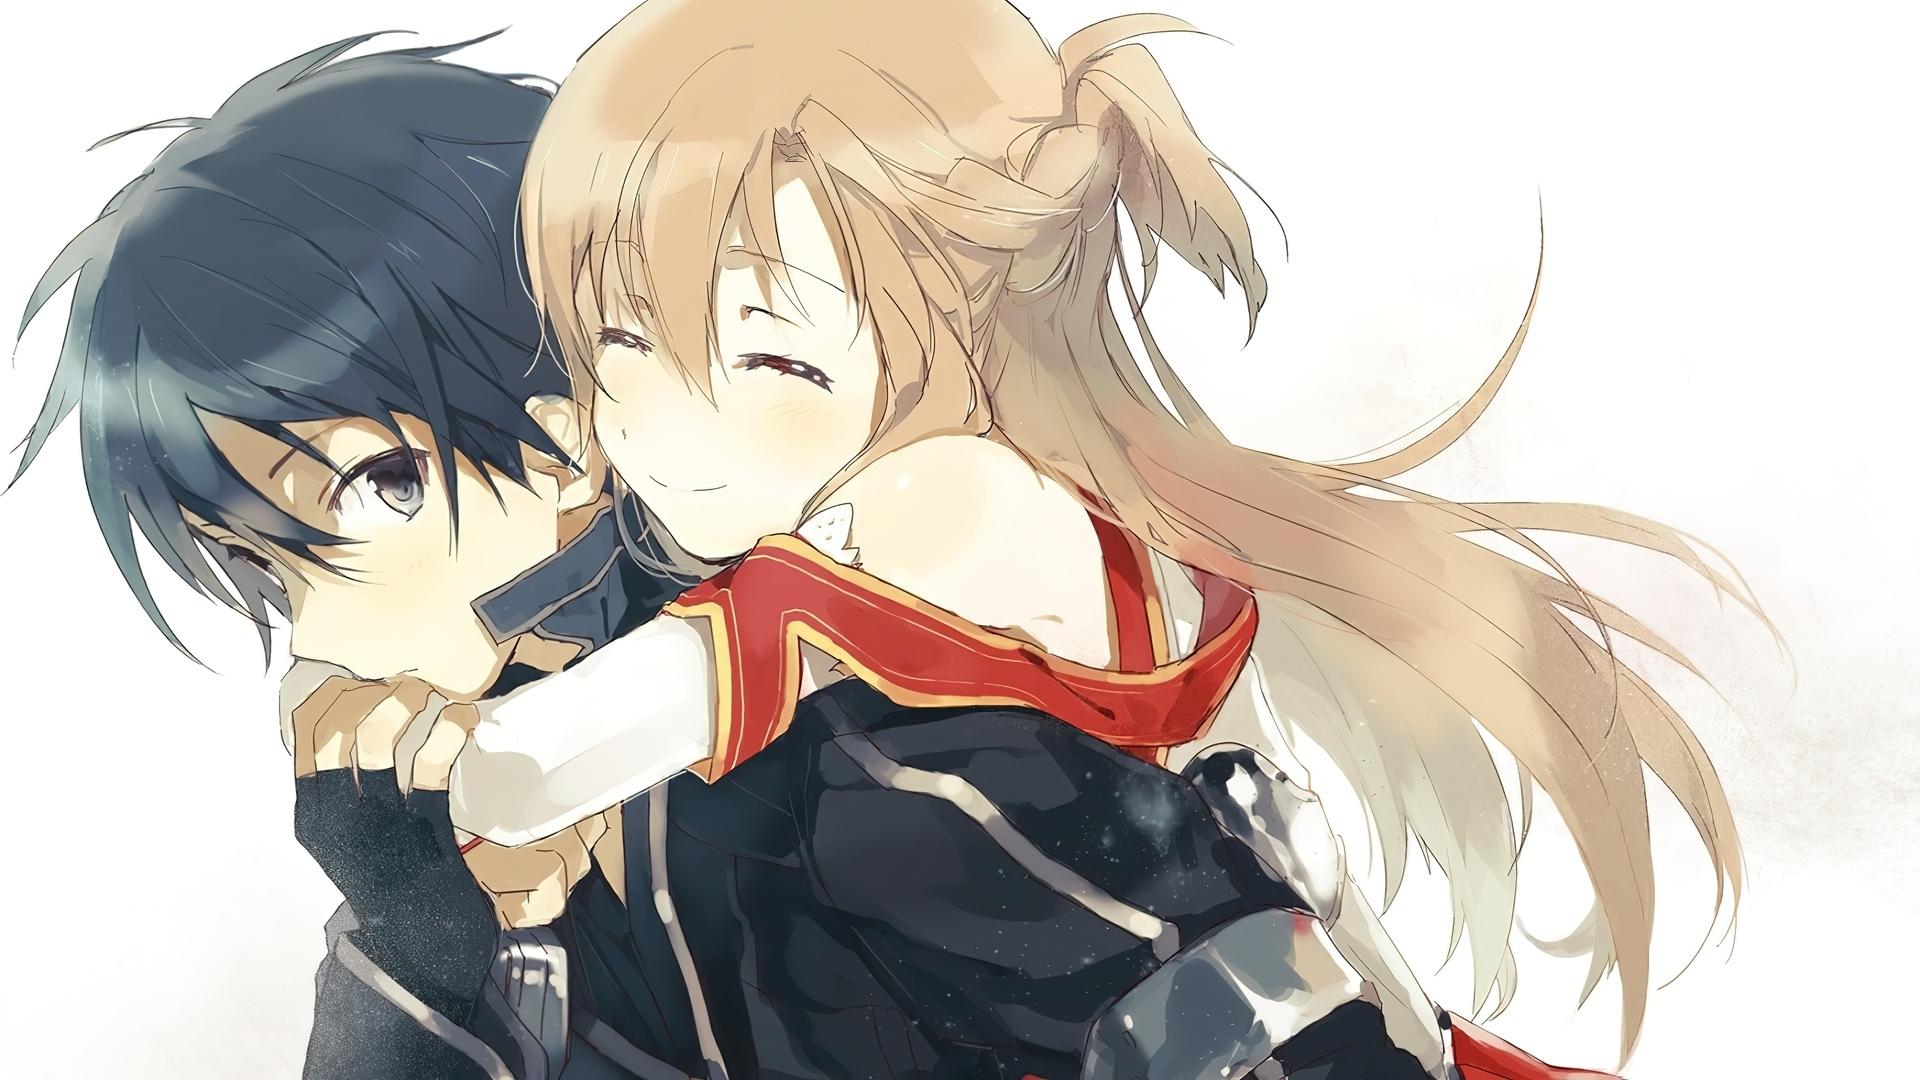 Kazuto, Kirito, Sword Art Online